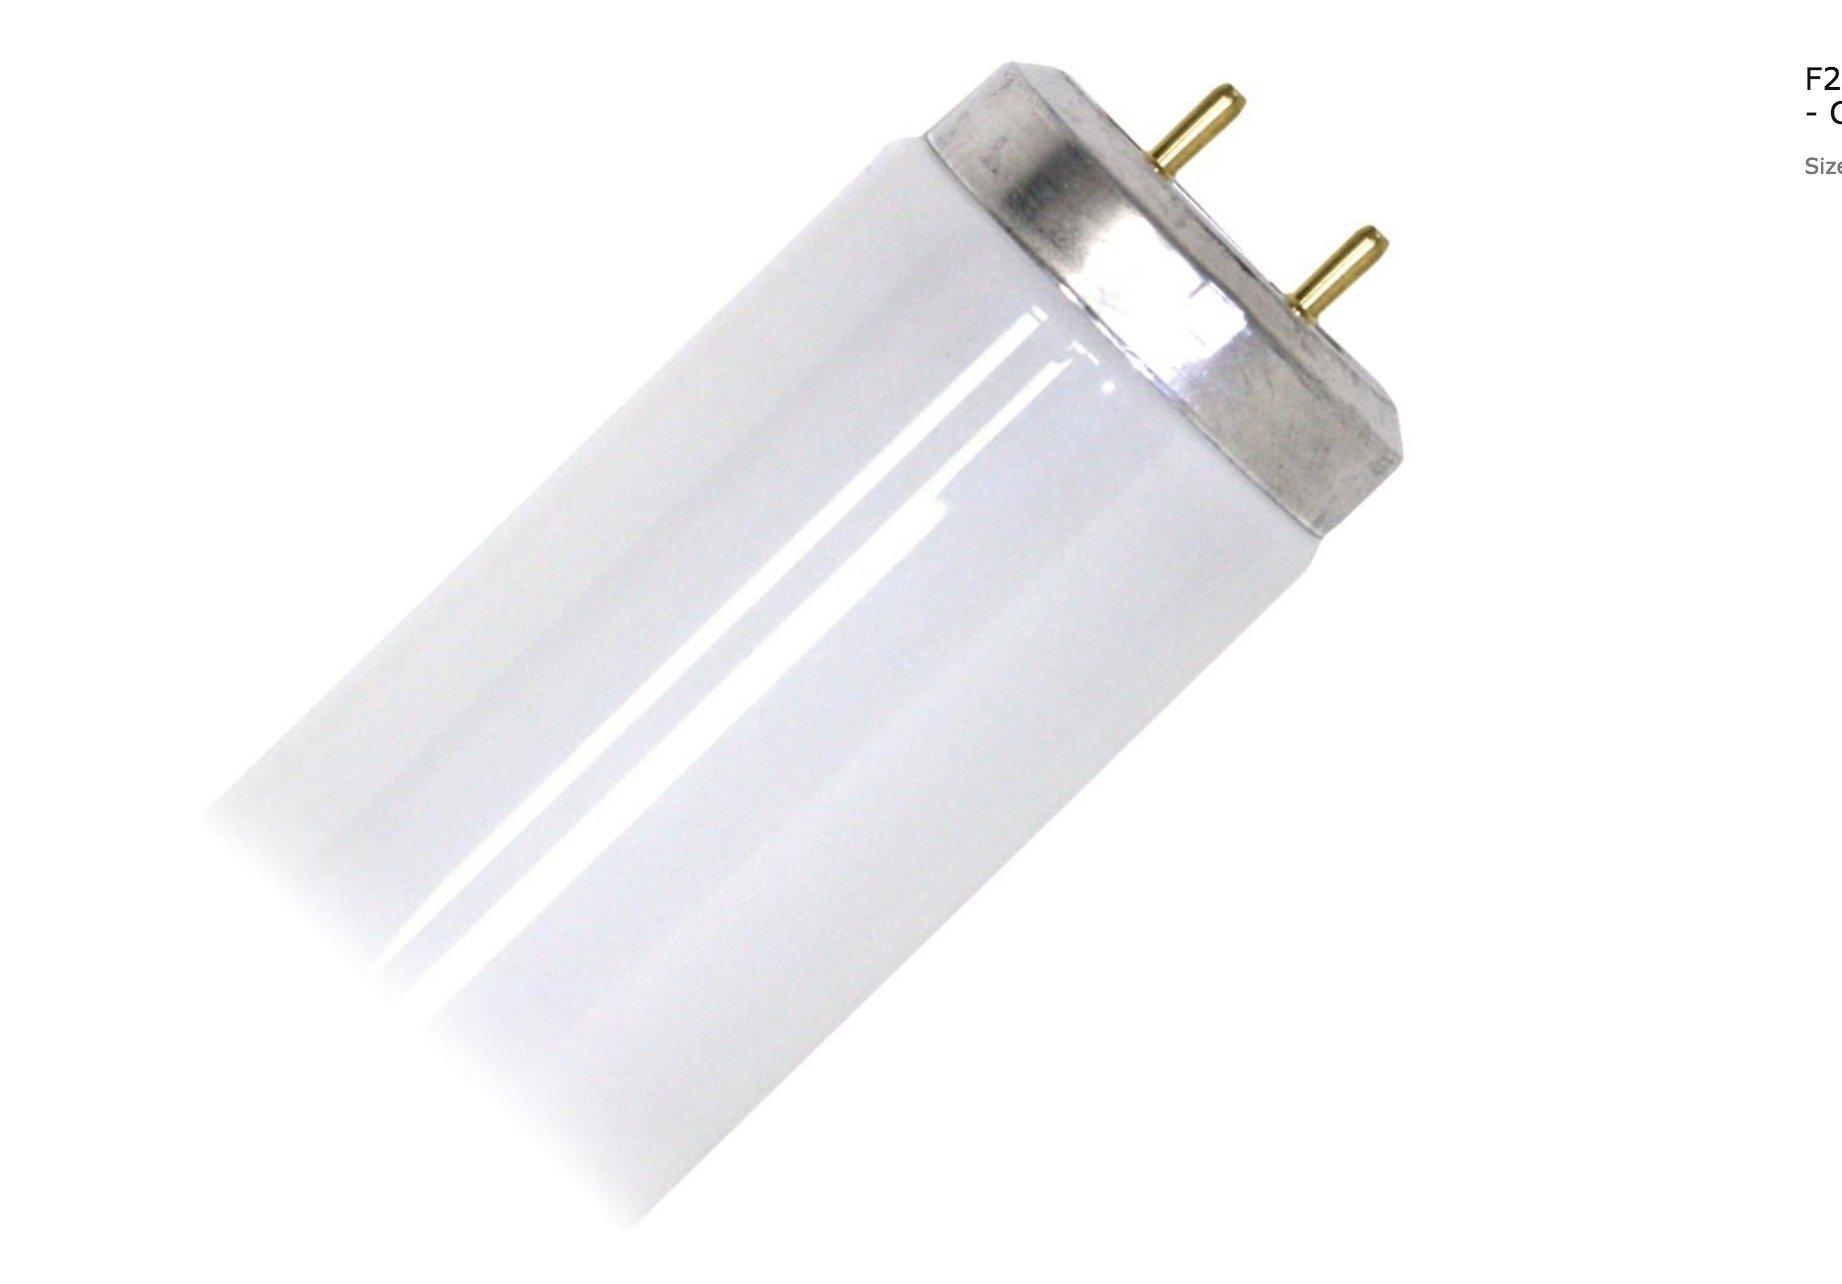 (10 Pack) Philips 422758 - F40T12/TL830 Soft White Deluxe 40 Watt T12 Fluorescent Tube Light Bulb 40W F40T12 Warm White 3000K - Replaces F40/SP30/ECO F40/SPX30/ECO F40/D30/ECO